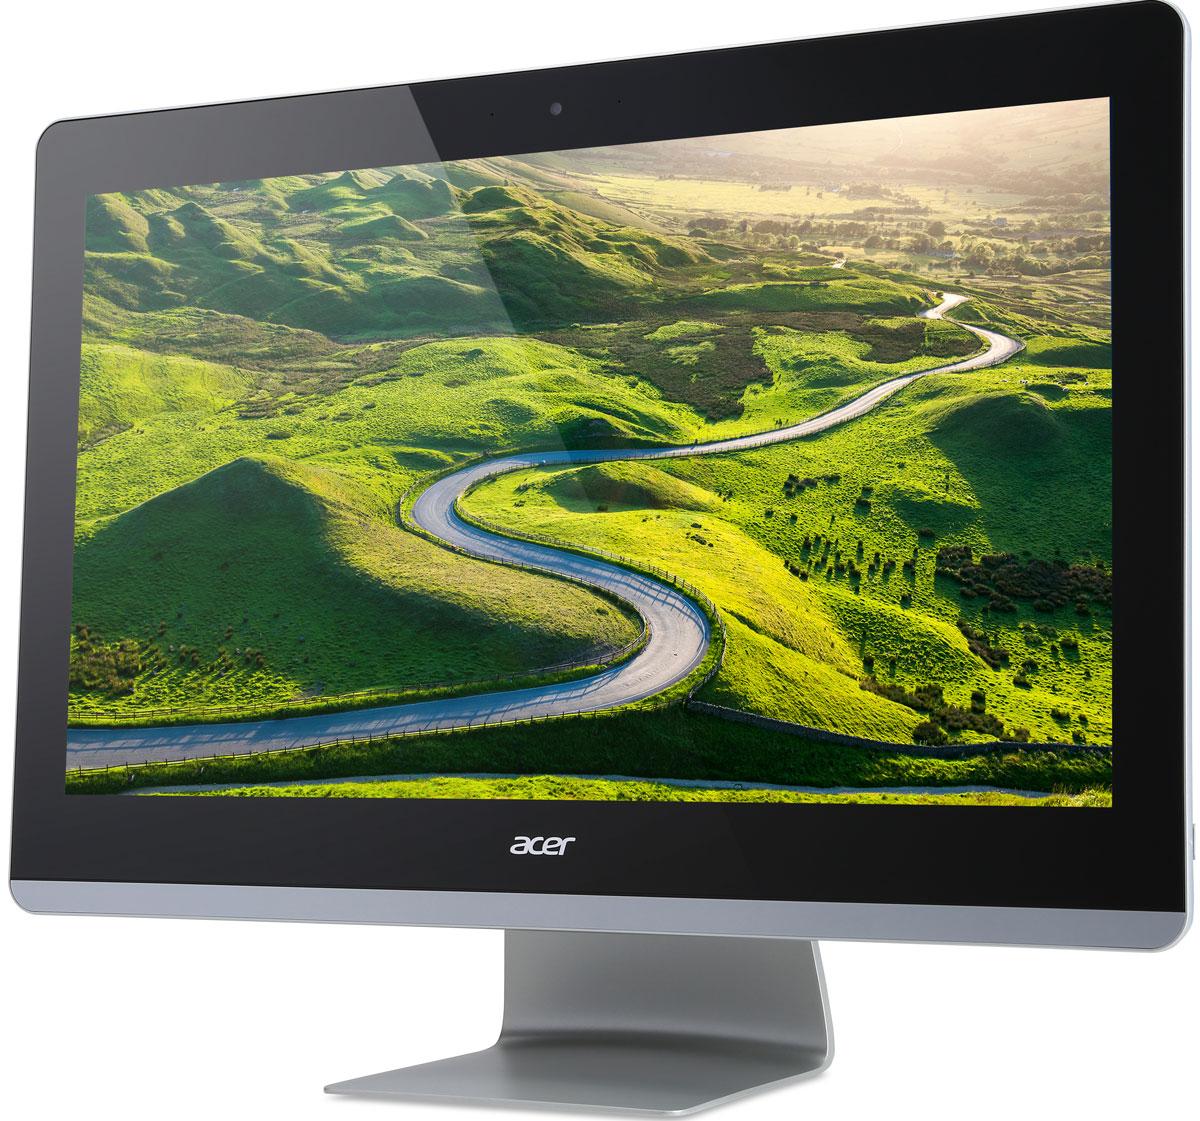 цены Acer Aspire Z3-715, Black моноблок (DQ.B84ER.007)